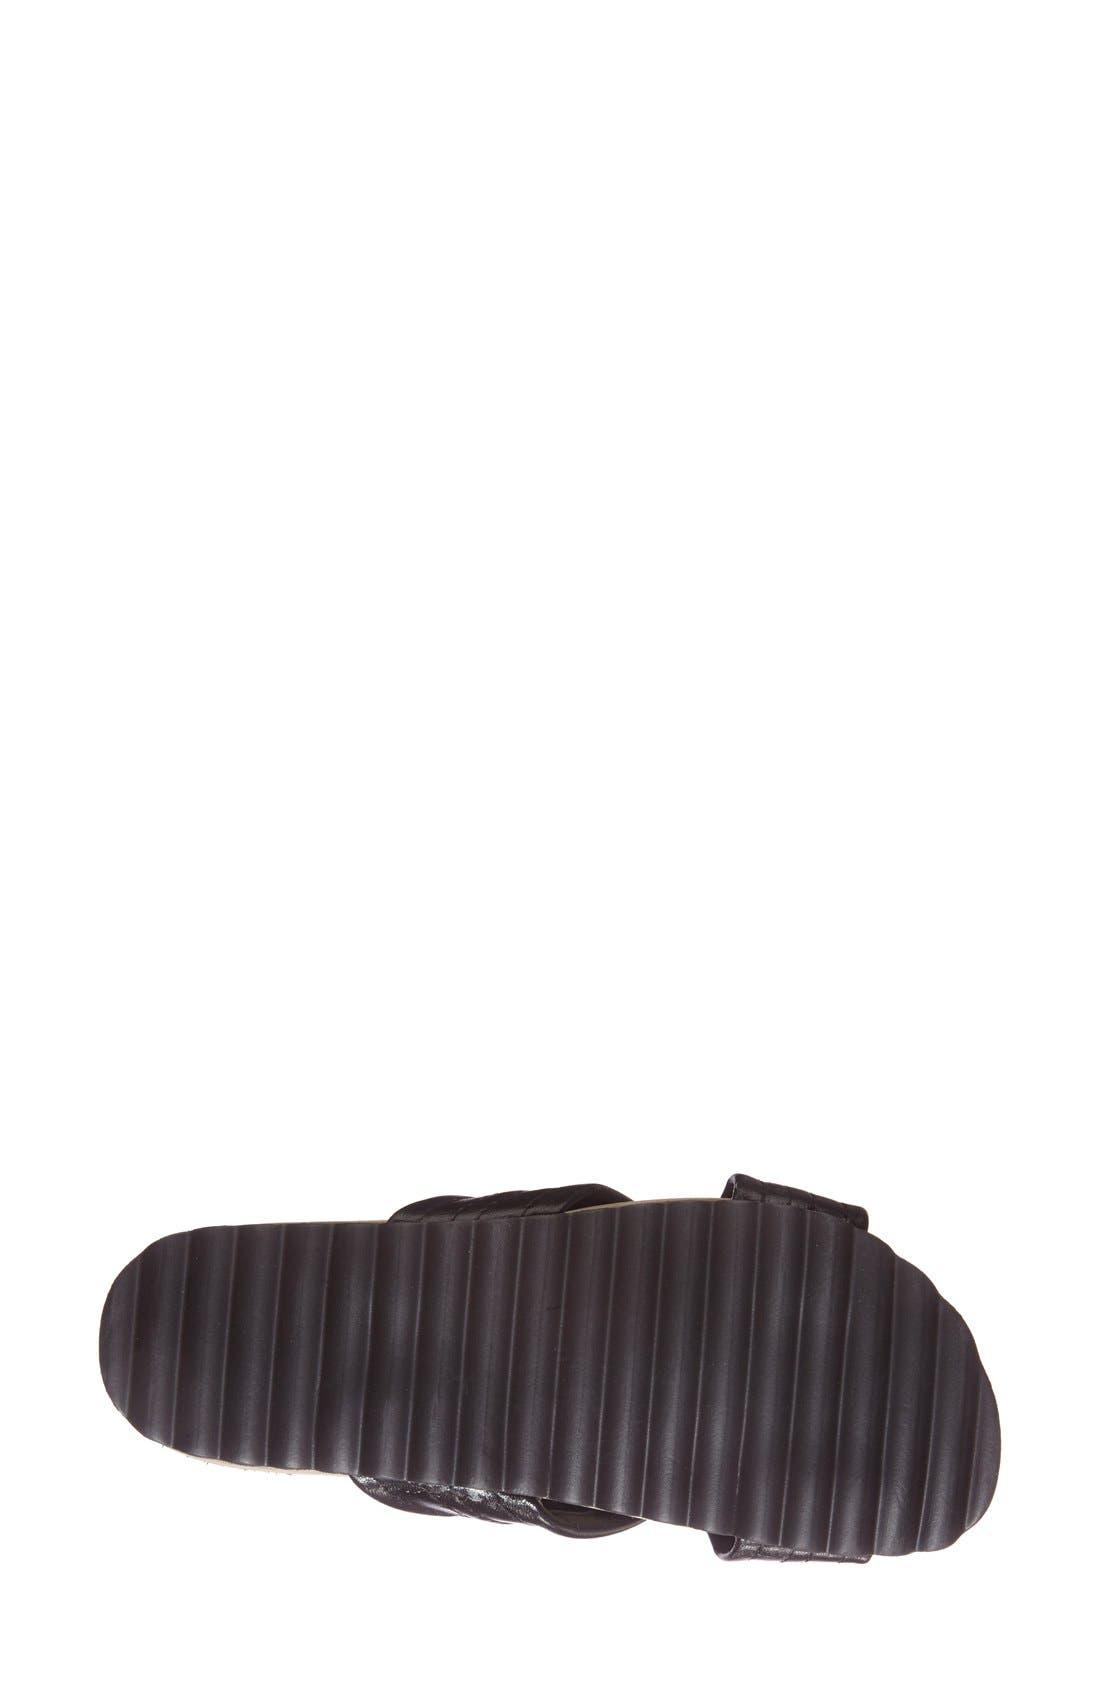 DUNE LONDON, 'Jolenes' Leather Slide Sandal, Alternate thumbnail 4, color, 002